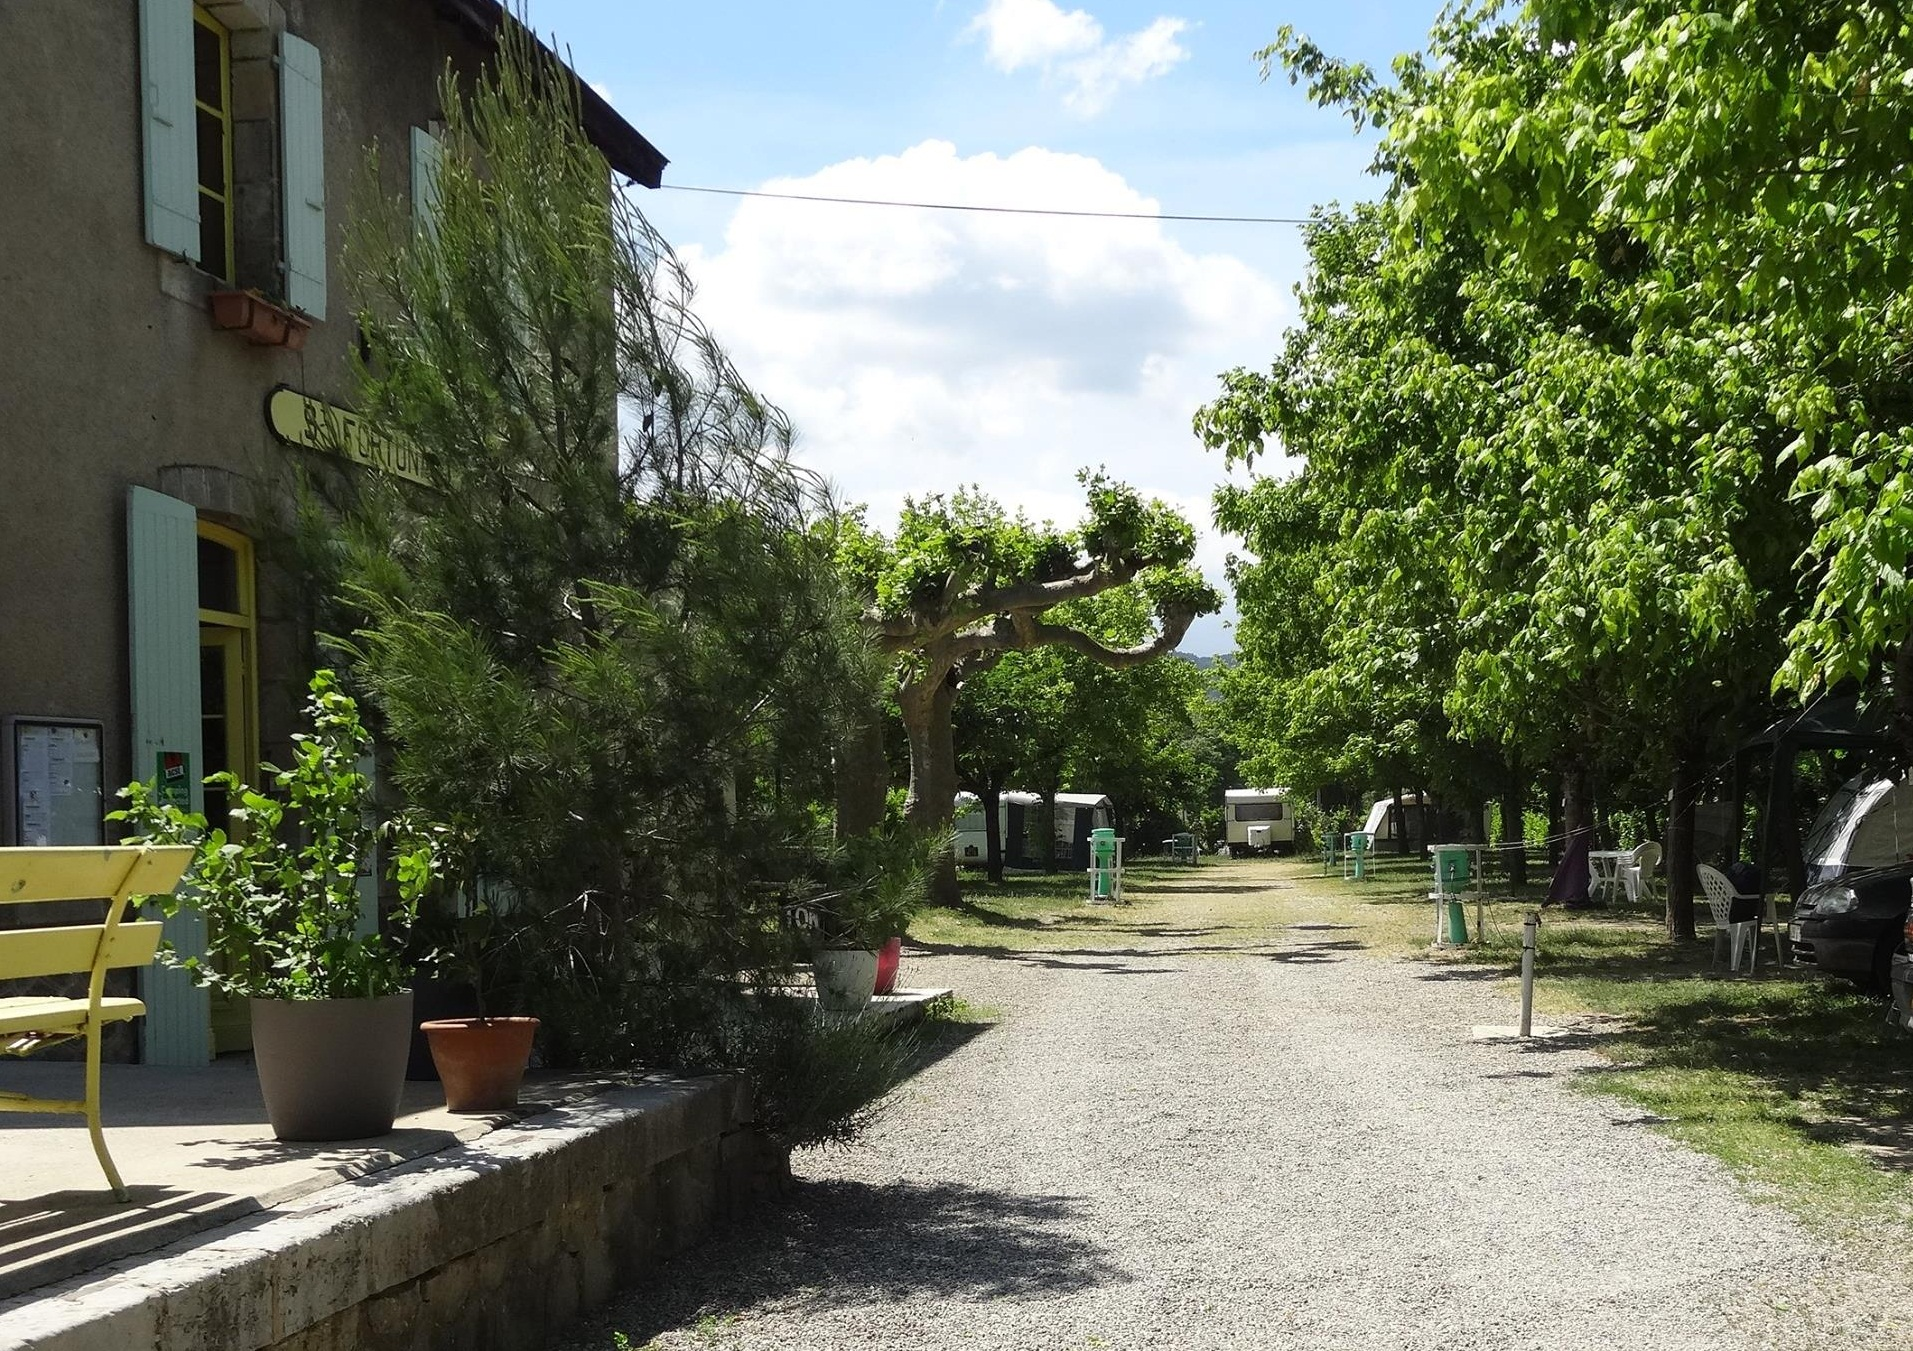 Camping sites : La Gare des Amis Campsite